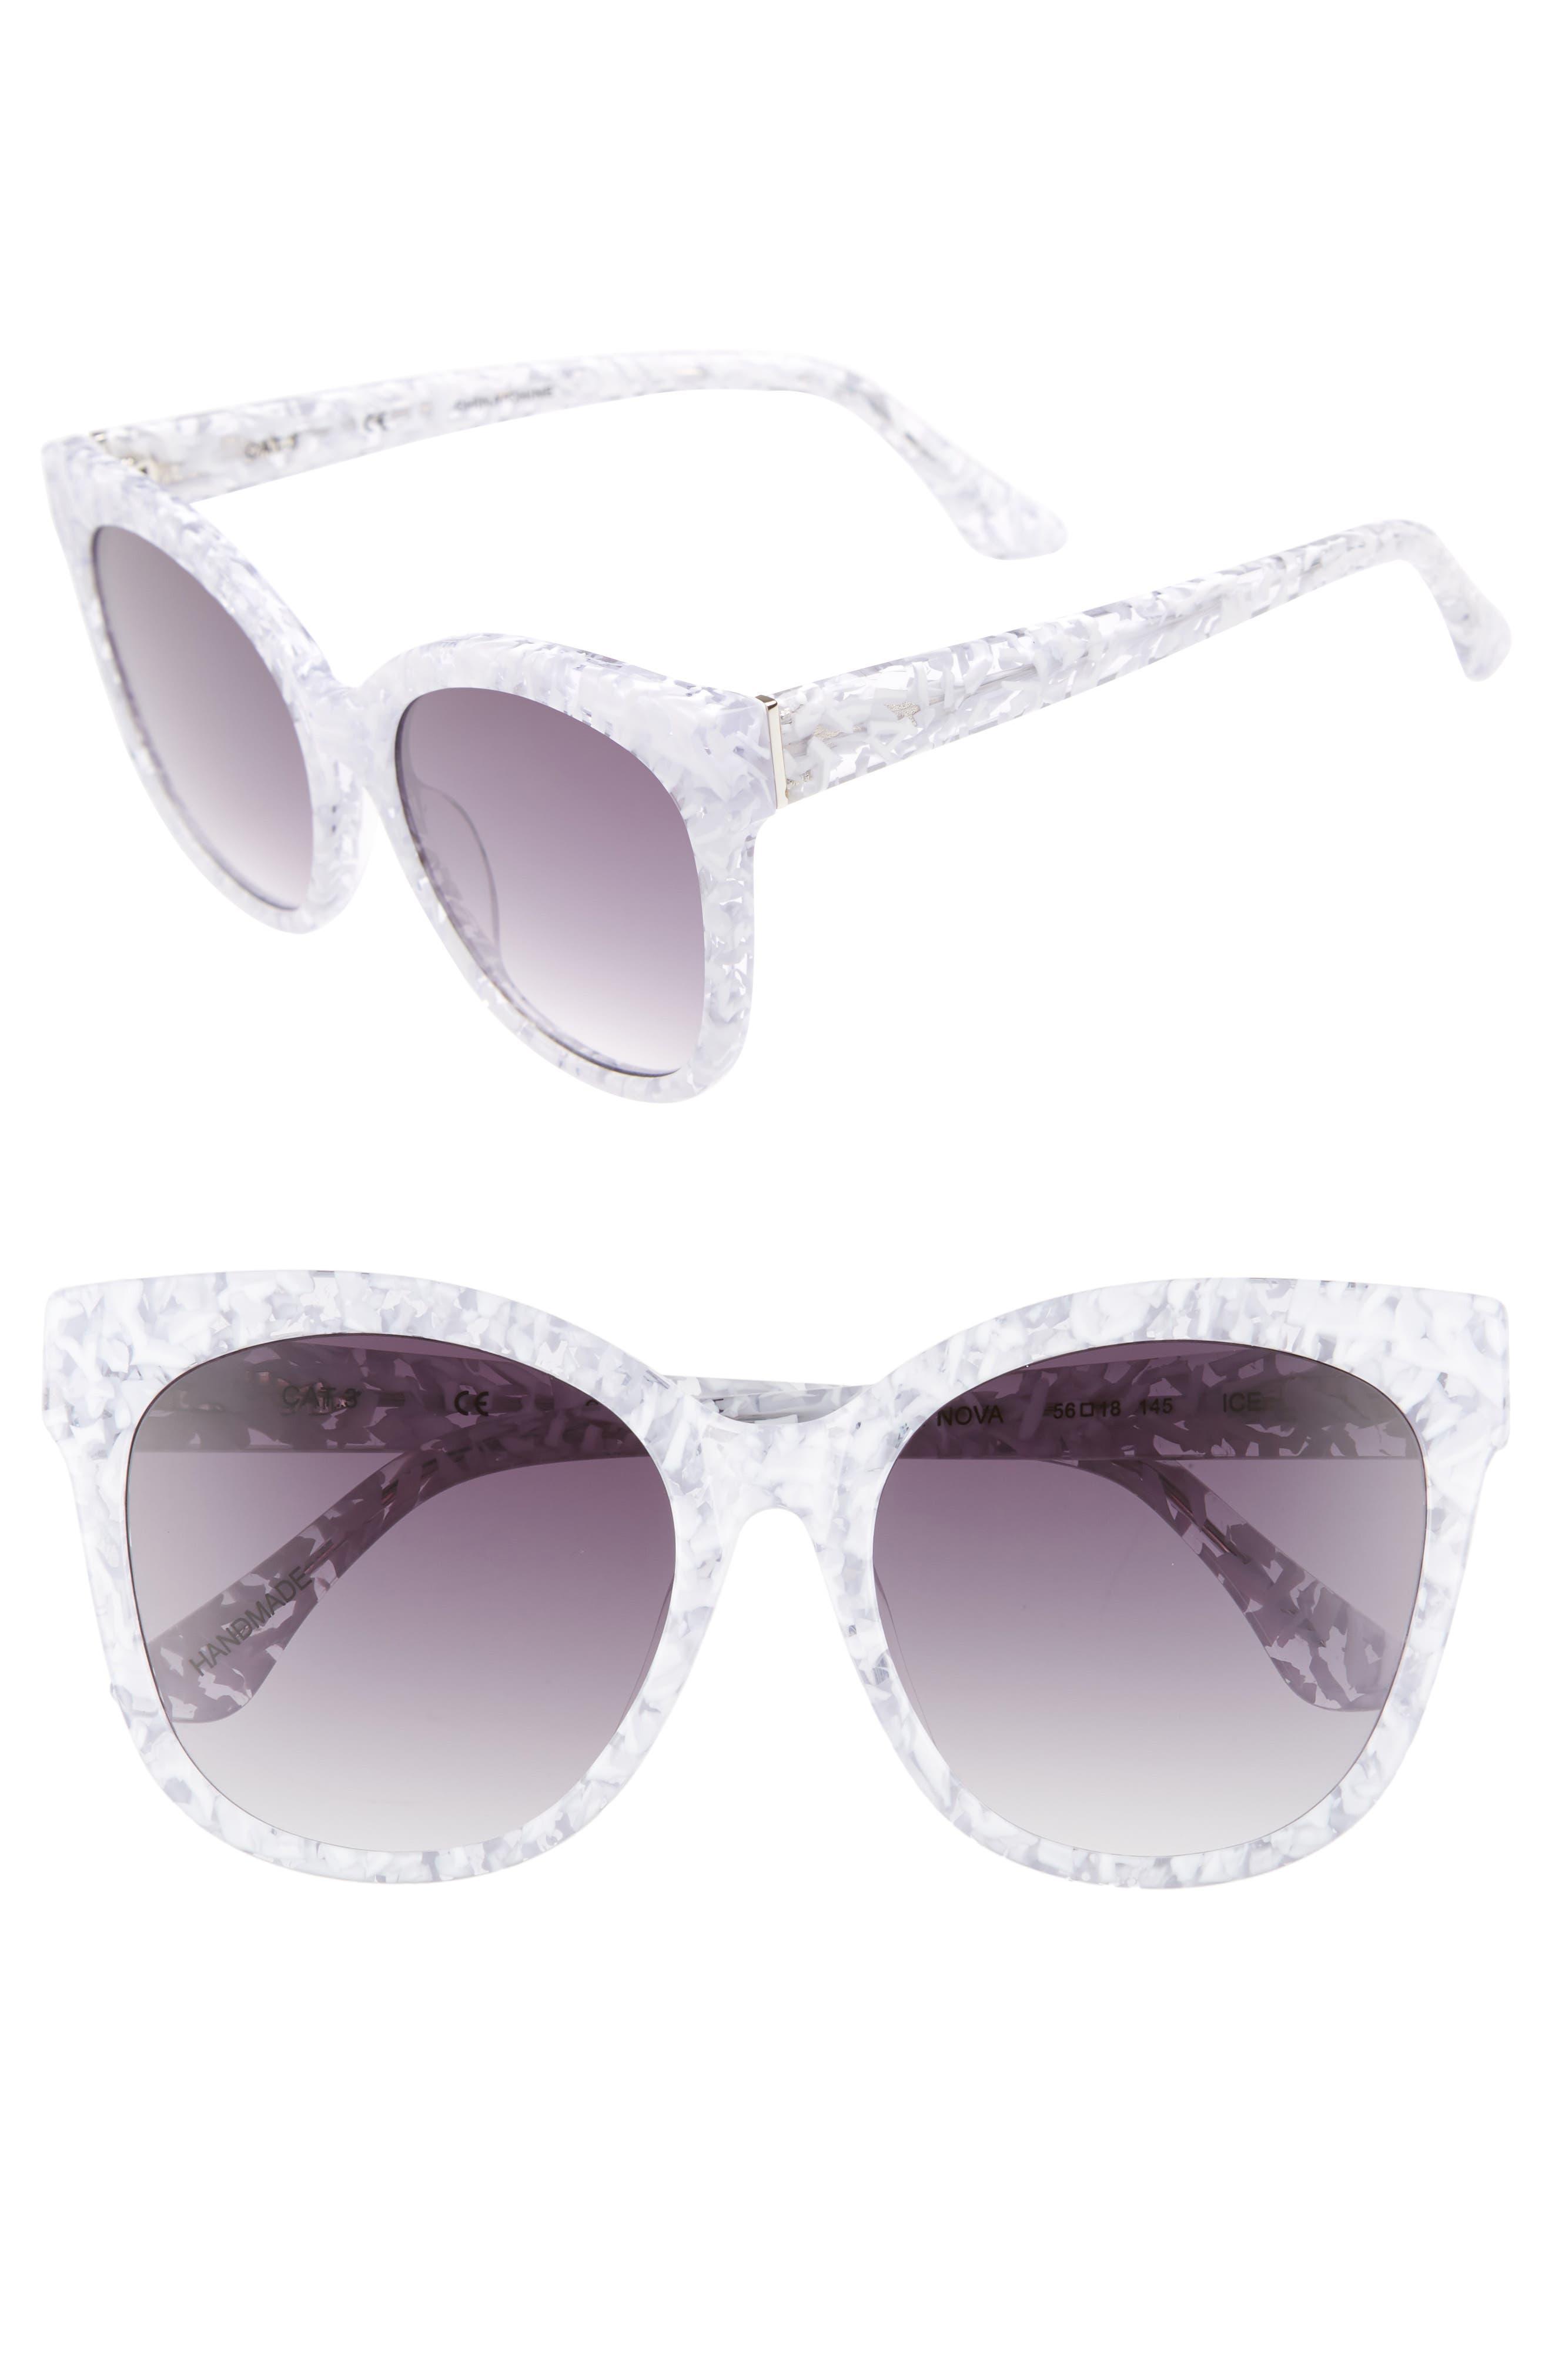 Bossa Nova 57mm Cat Eye Sunglasses,                             Main thumbnail 1, color,                             WHITE SPECKLE